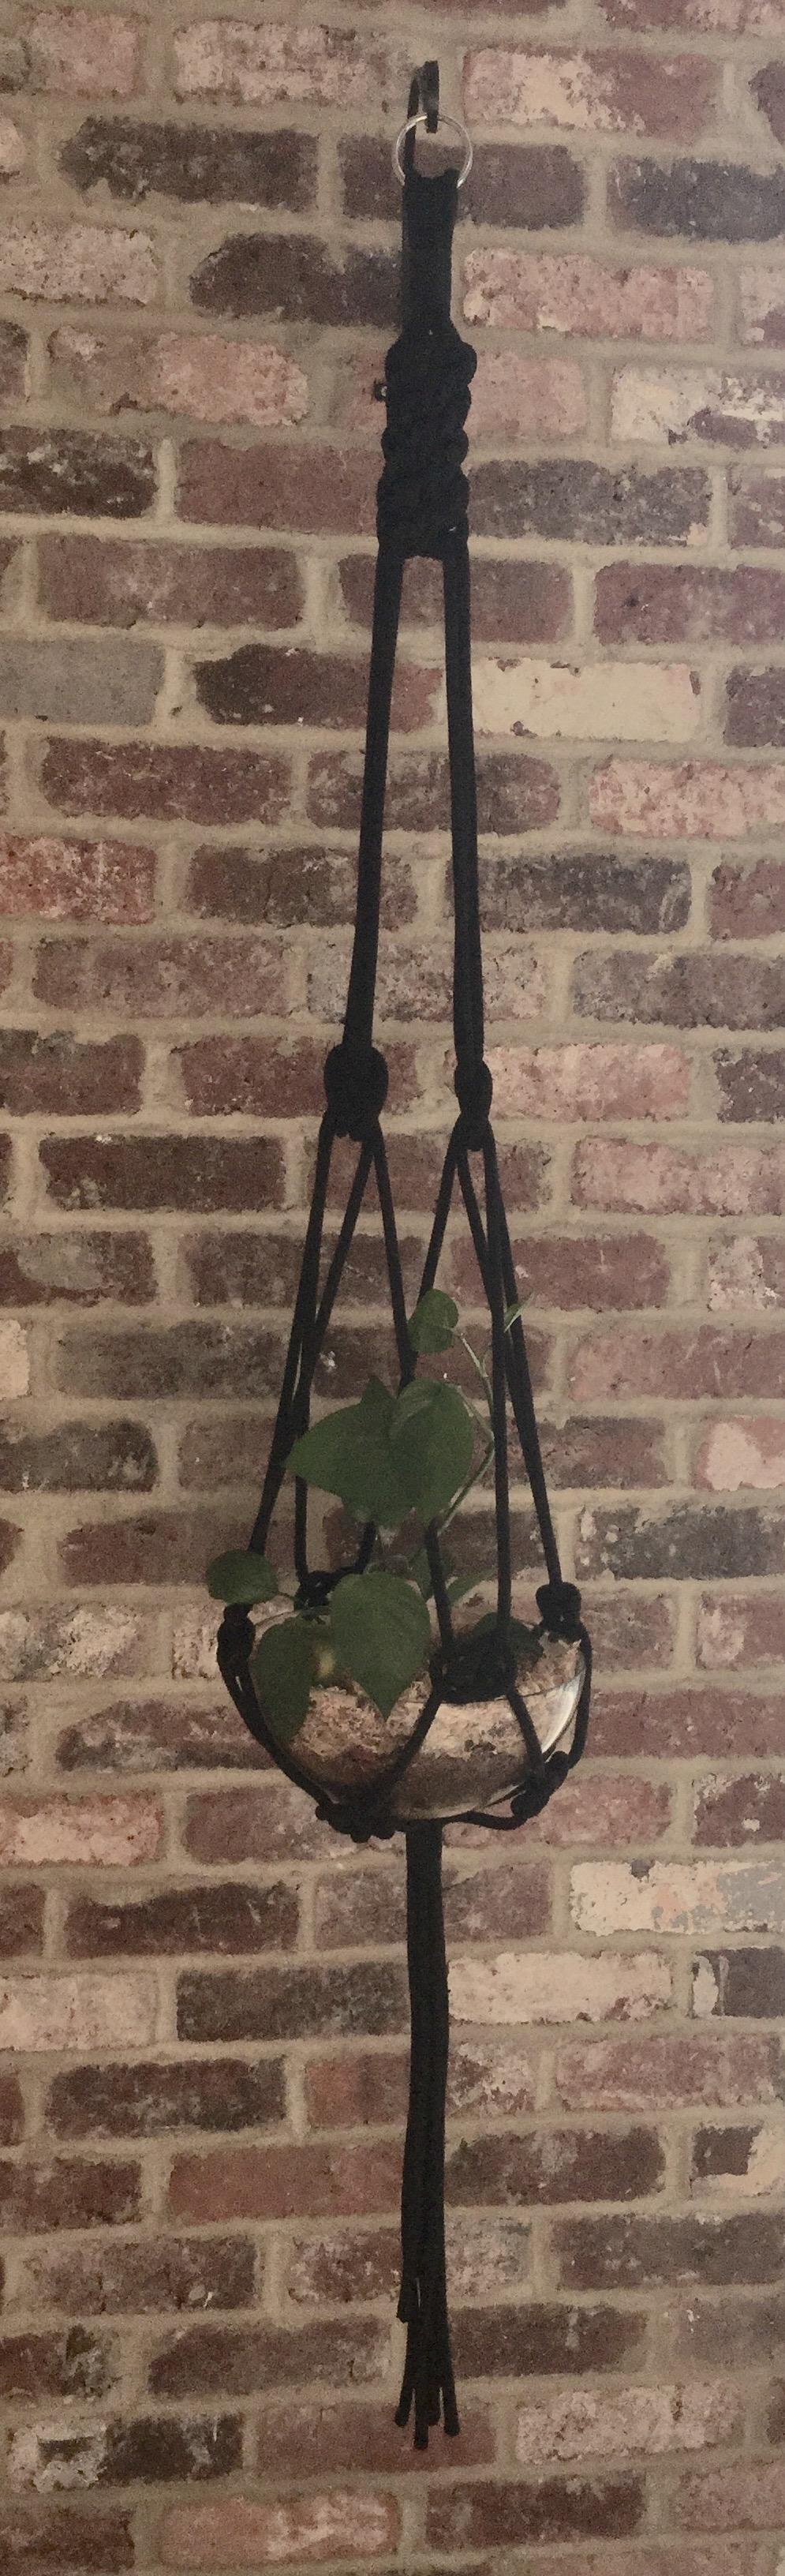 Black Macrame Plant Hanger 8mm Spun Polyester Rope